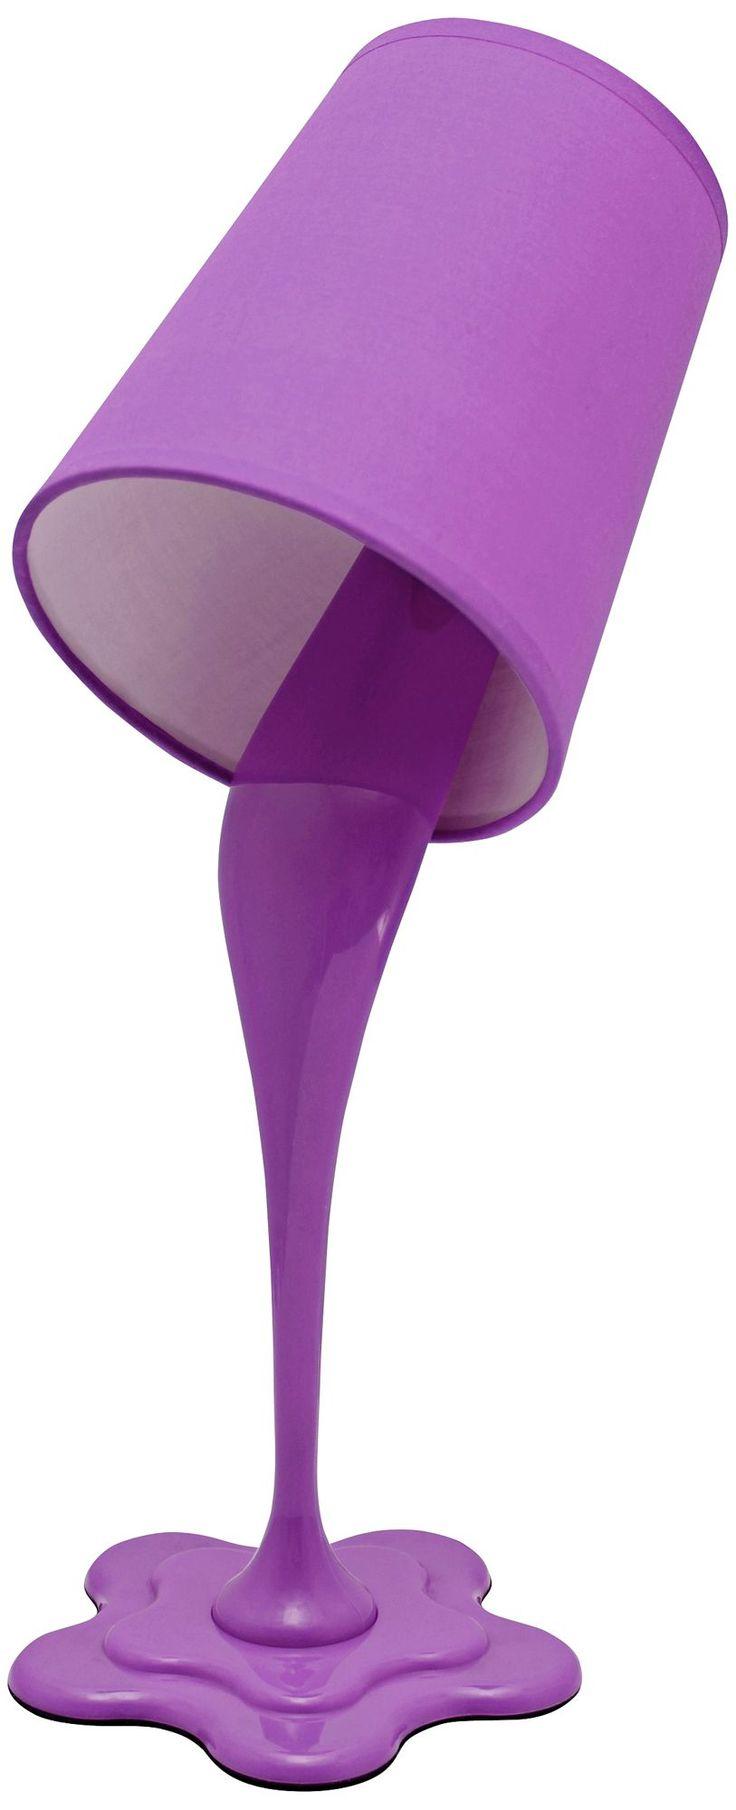 1000 ideas about Purple Lamp on Pinterest  Purple Home